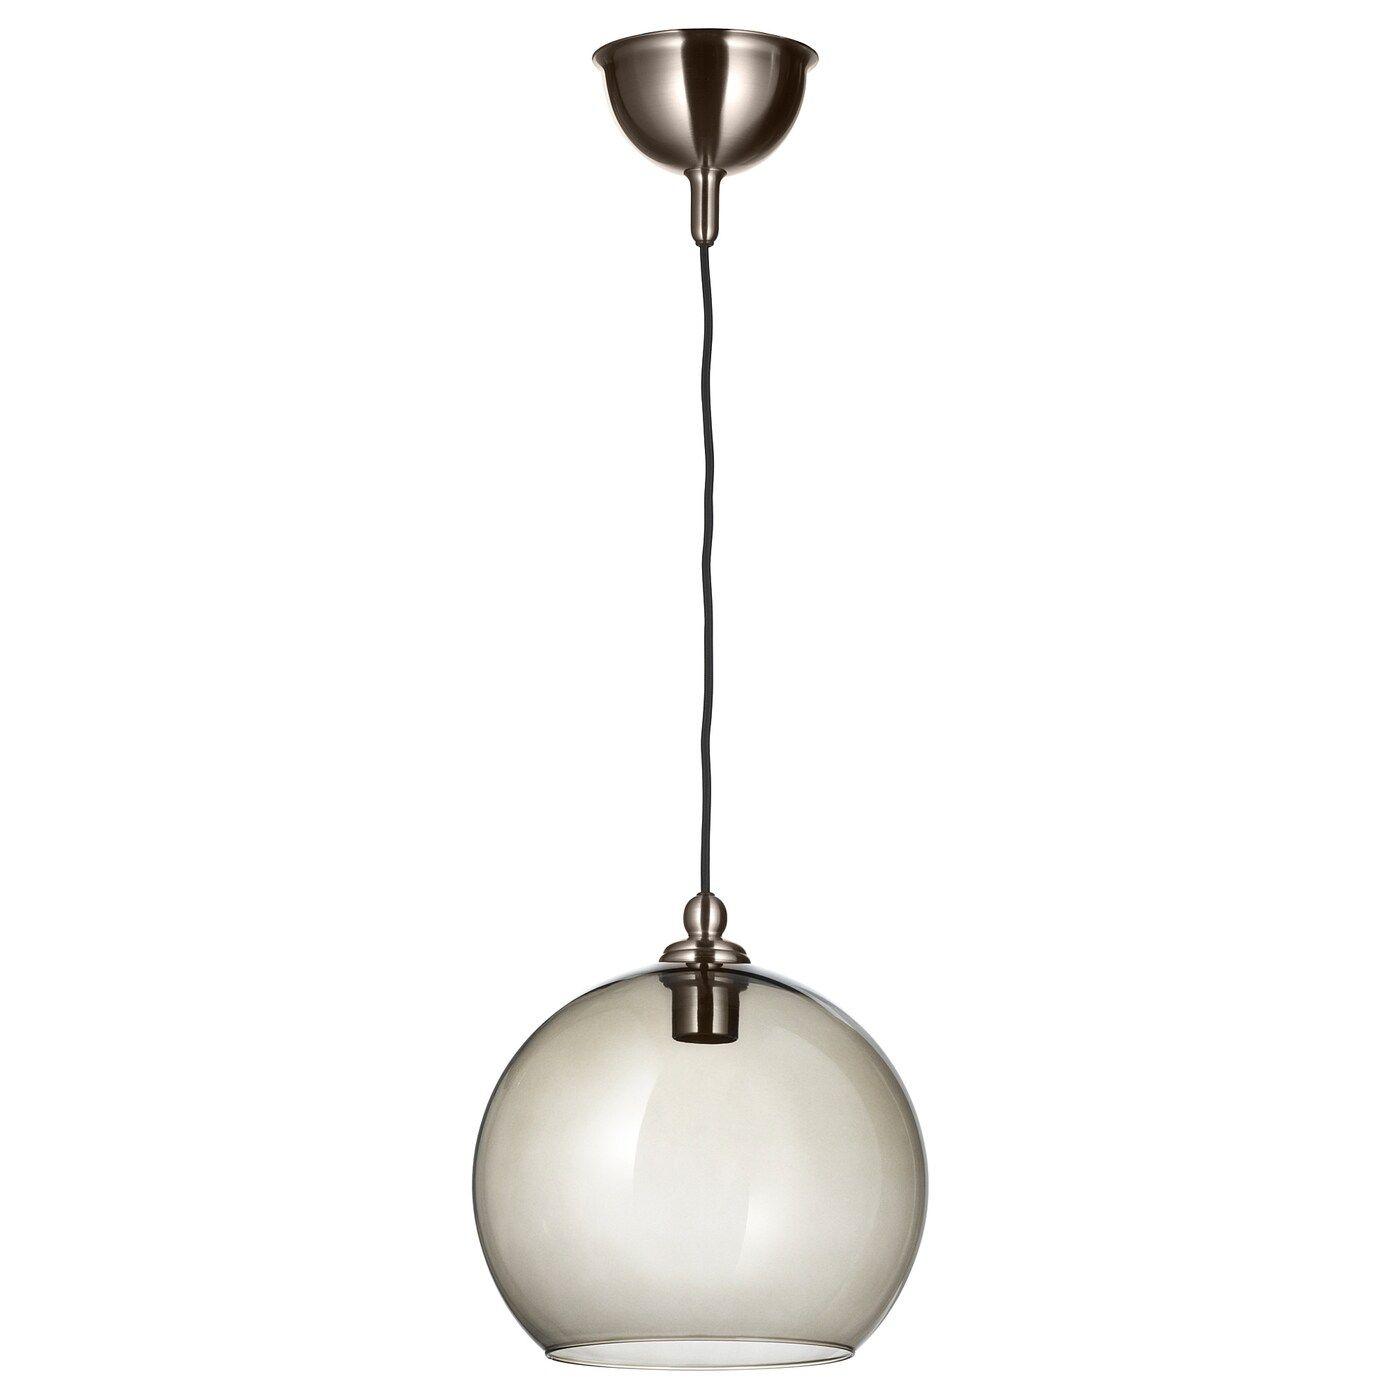 Gothem Jakobsbyn Pendant Lamp Dark Gray Smoked 12 In 2020 Pendant Lamp Pendant Lamp Shade Lamp